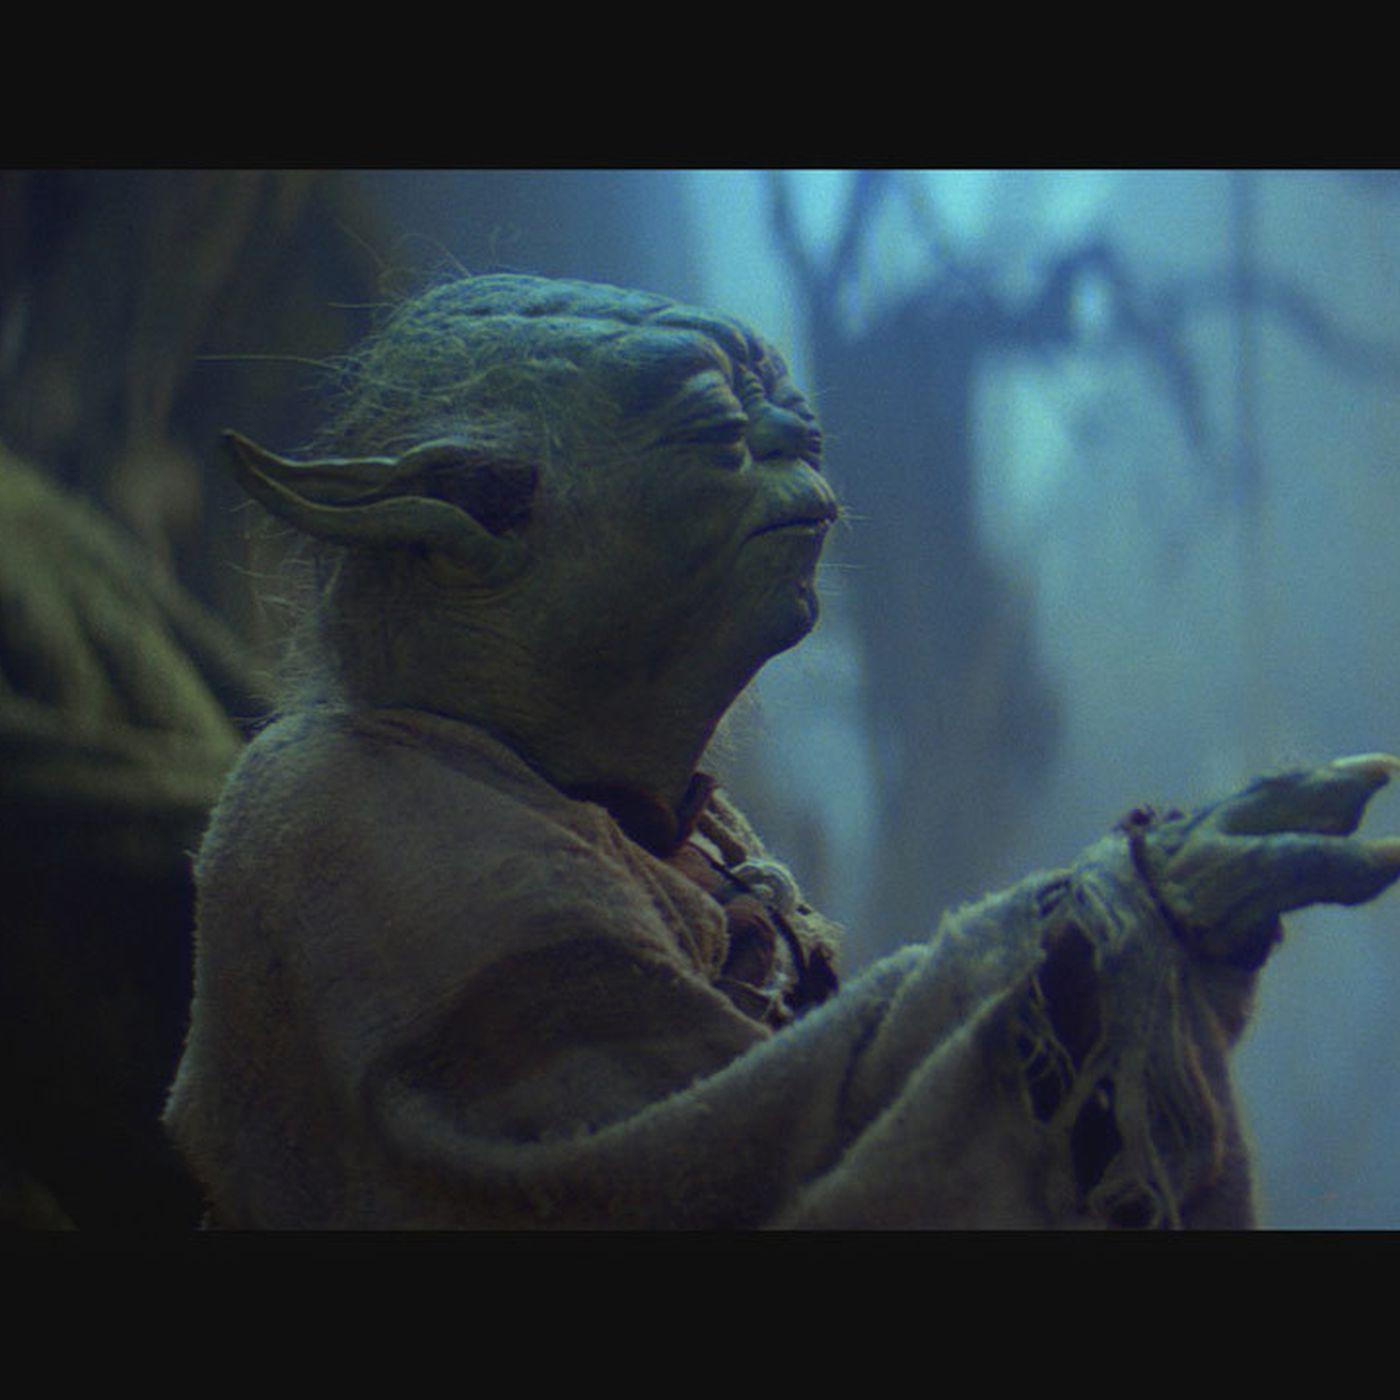 Long-awaited Star Wars: Empire Strikes Back 'Revisited' fan edit